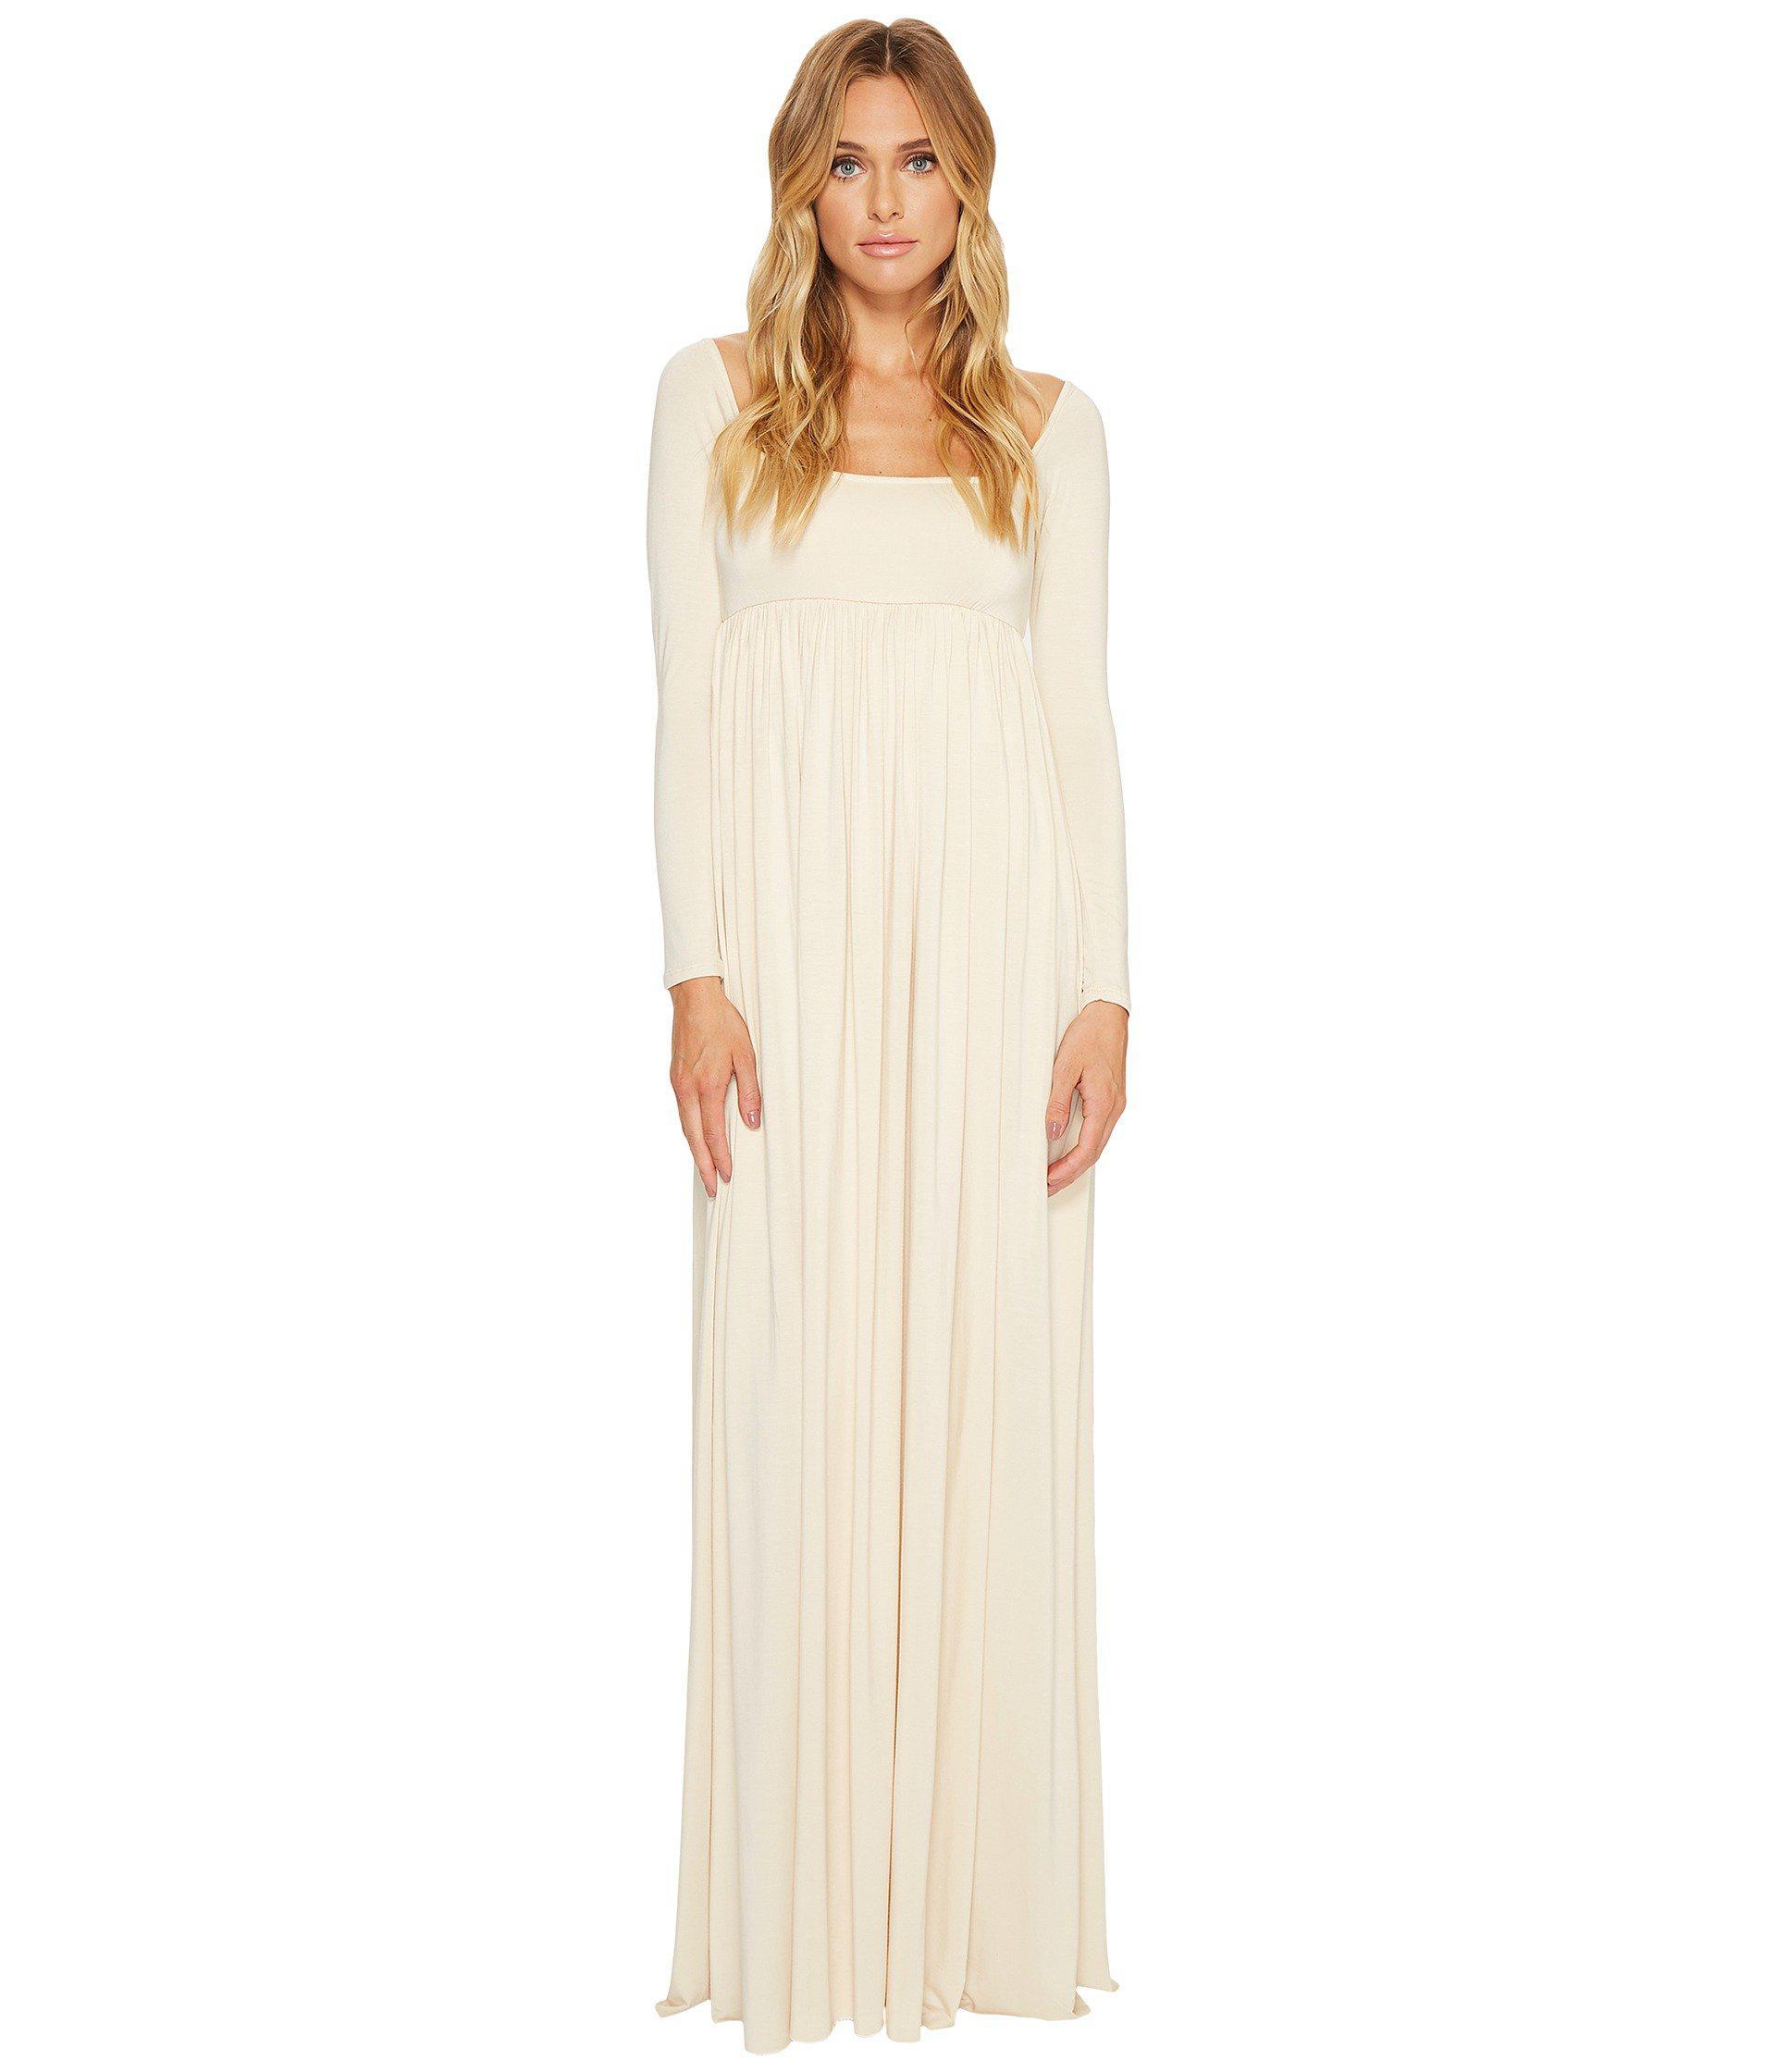 Lyst - Rachel Pally Isa Dress (cream) Women\'s Dress in Natural